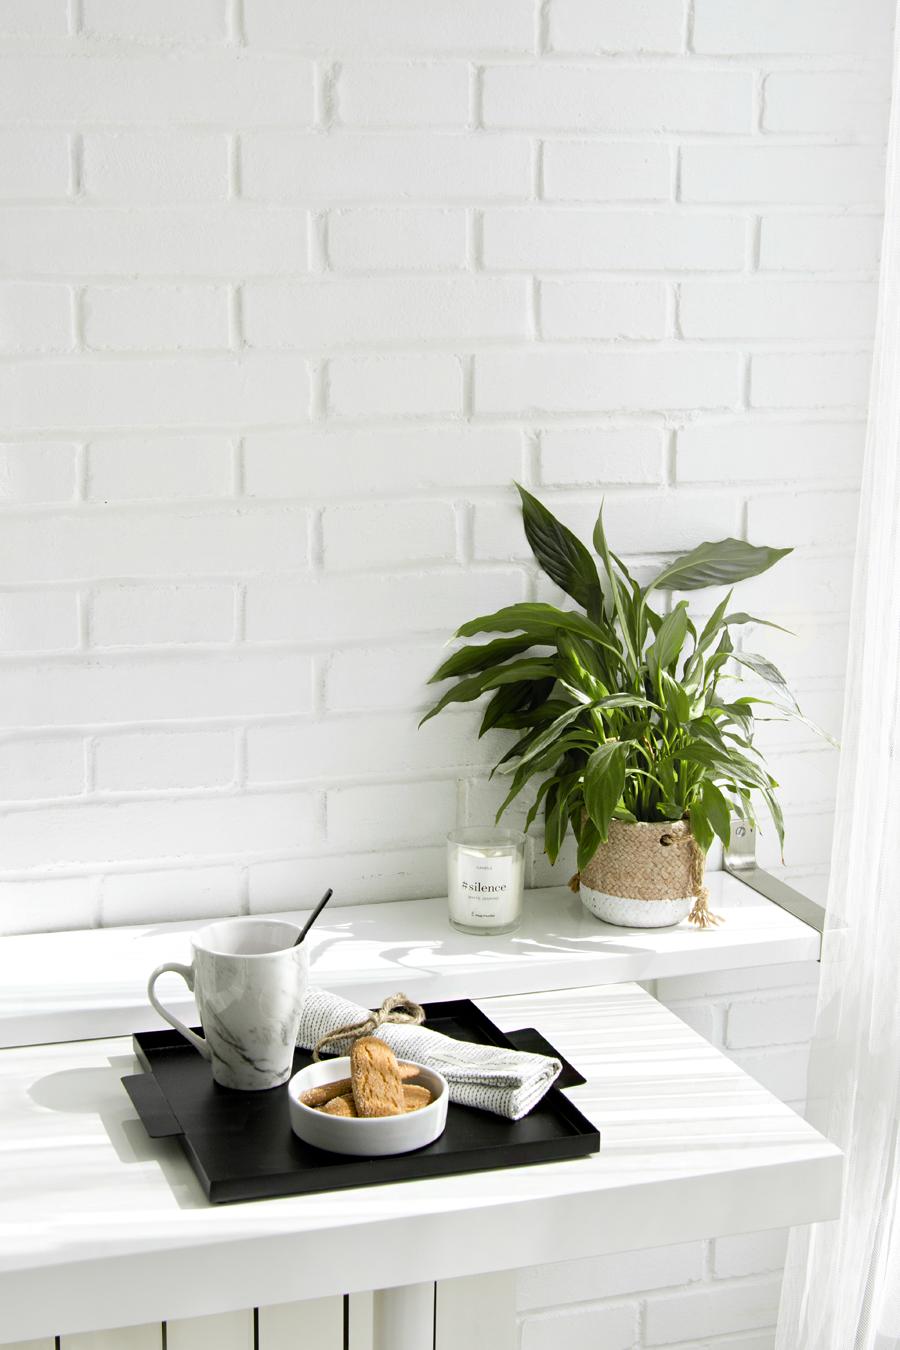 How to decor a small terrace / Cómo decorar una terraza pequeña